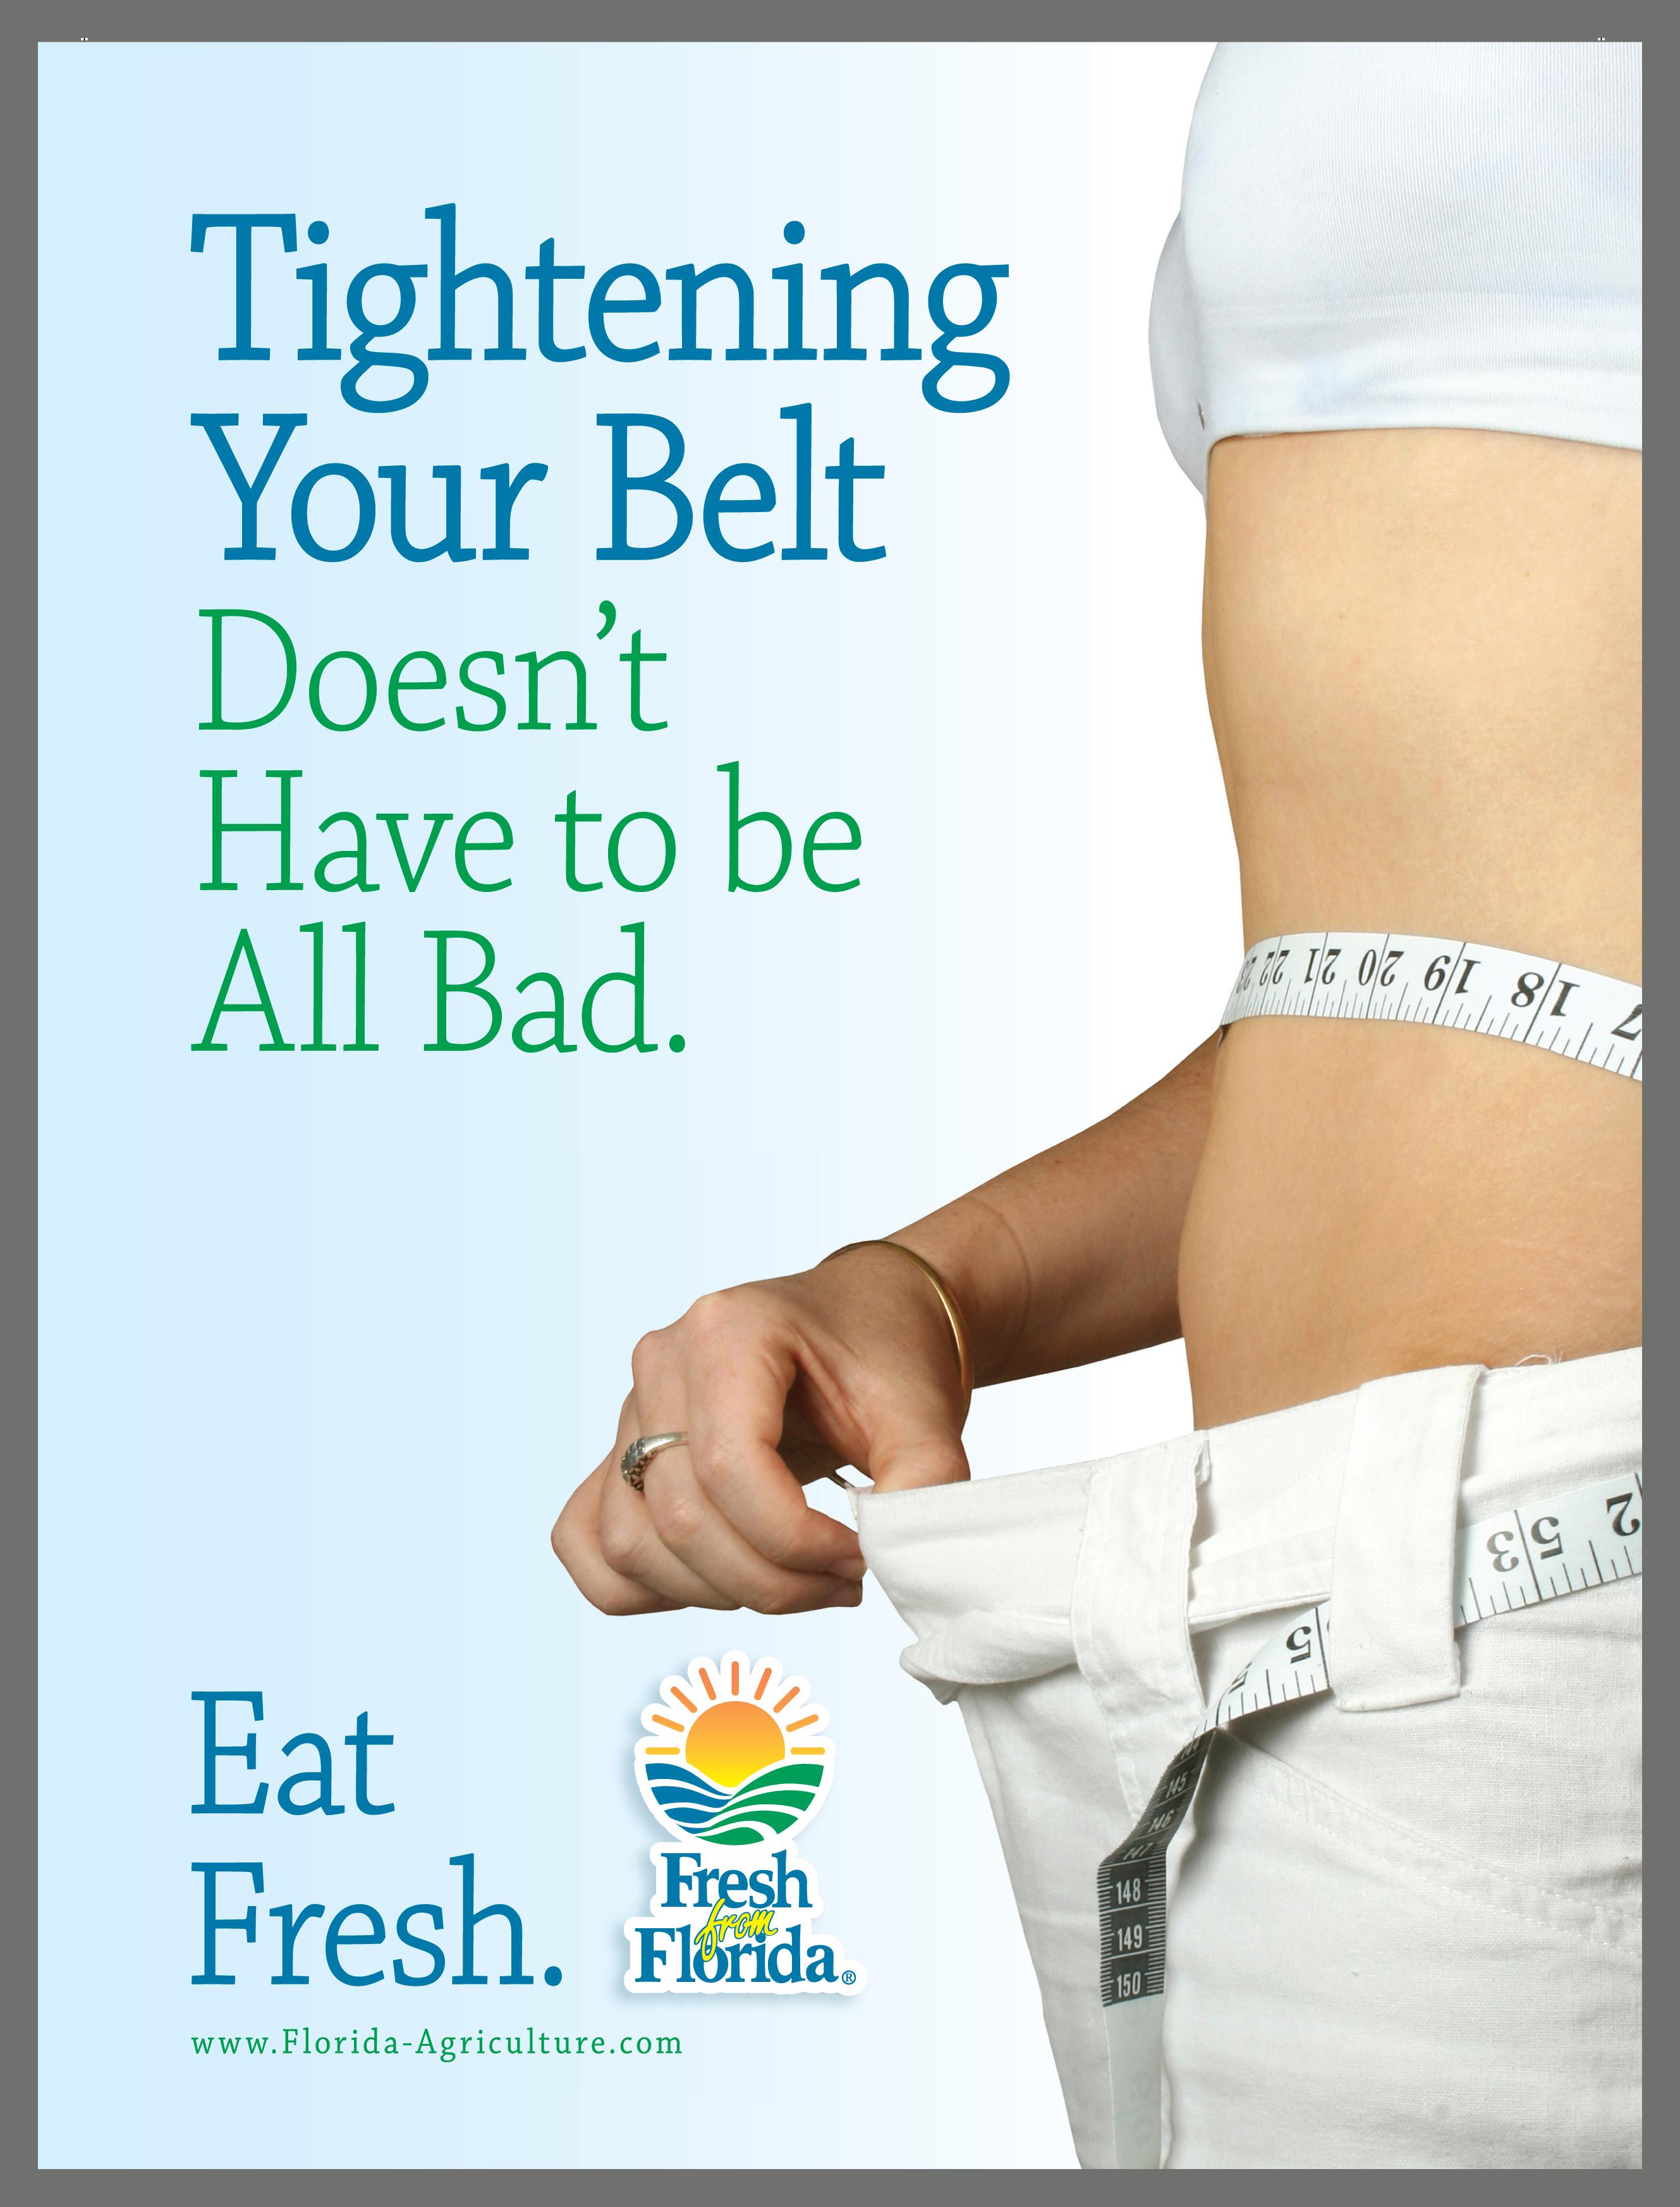 3604-PRINT-Belt Tight ad-Fla Monthly